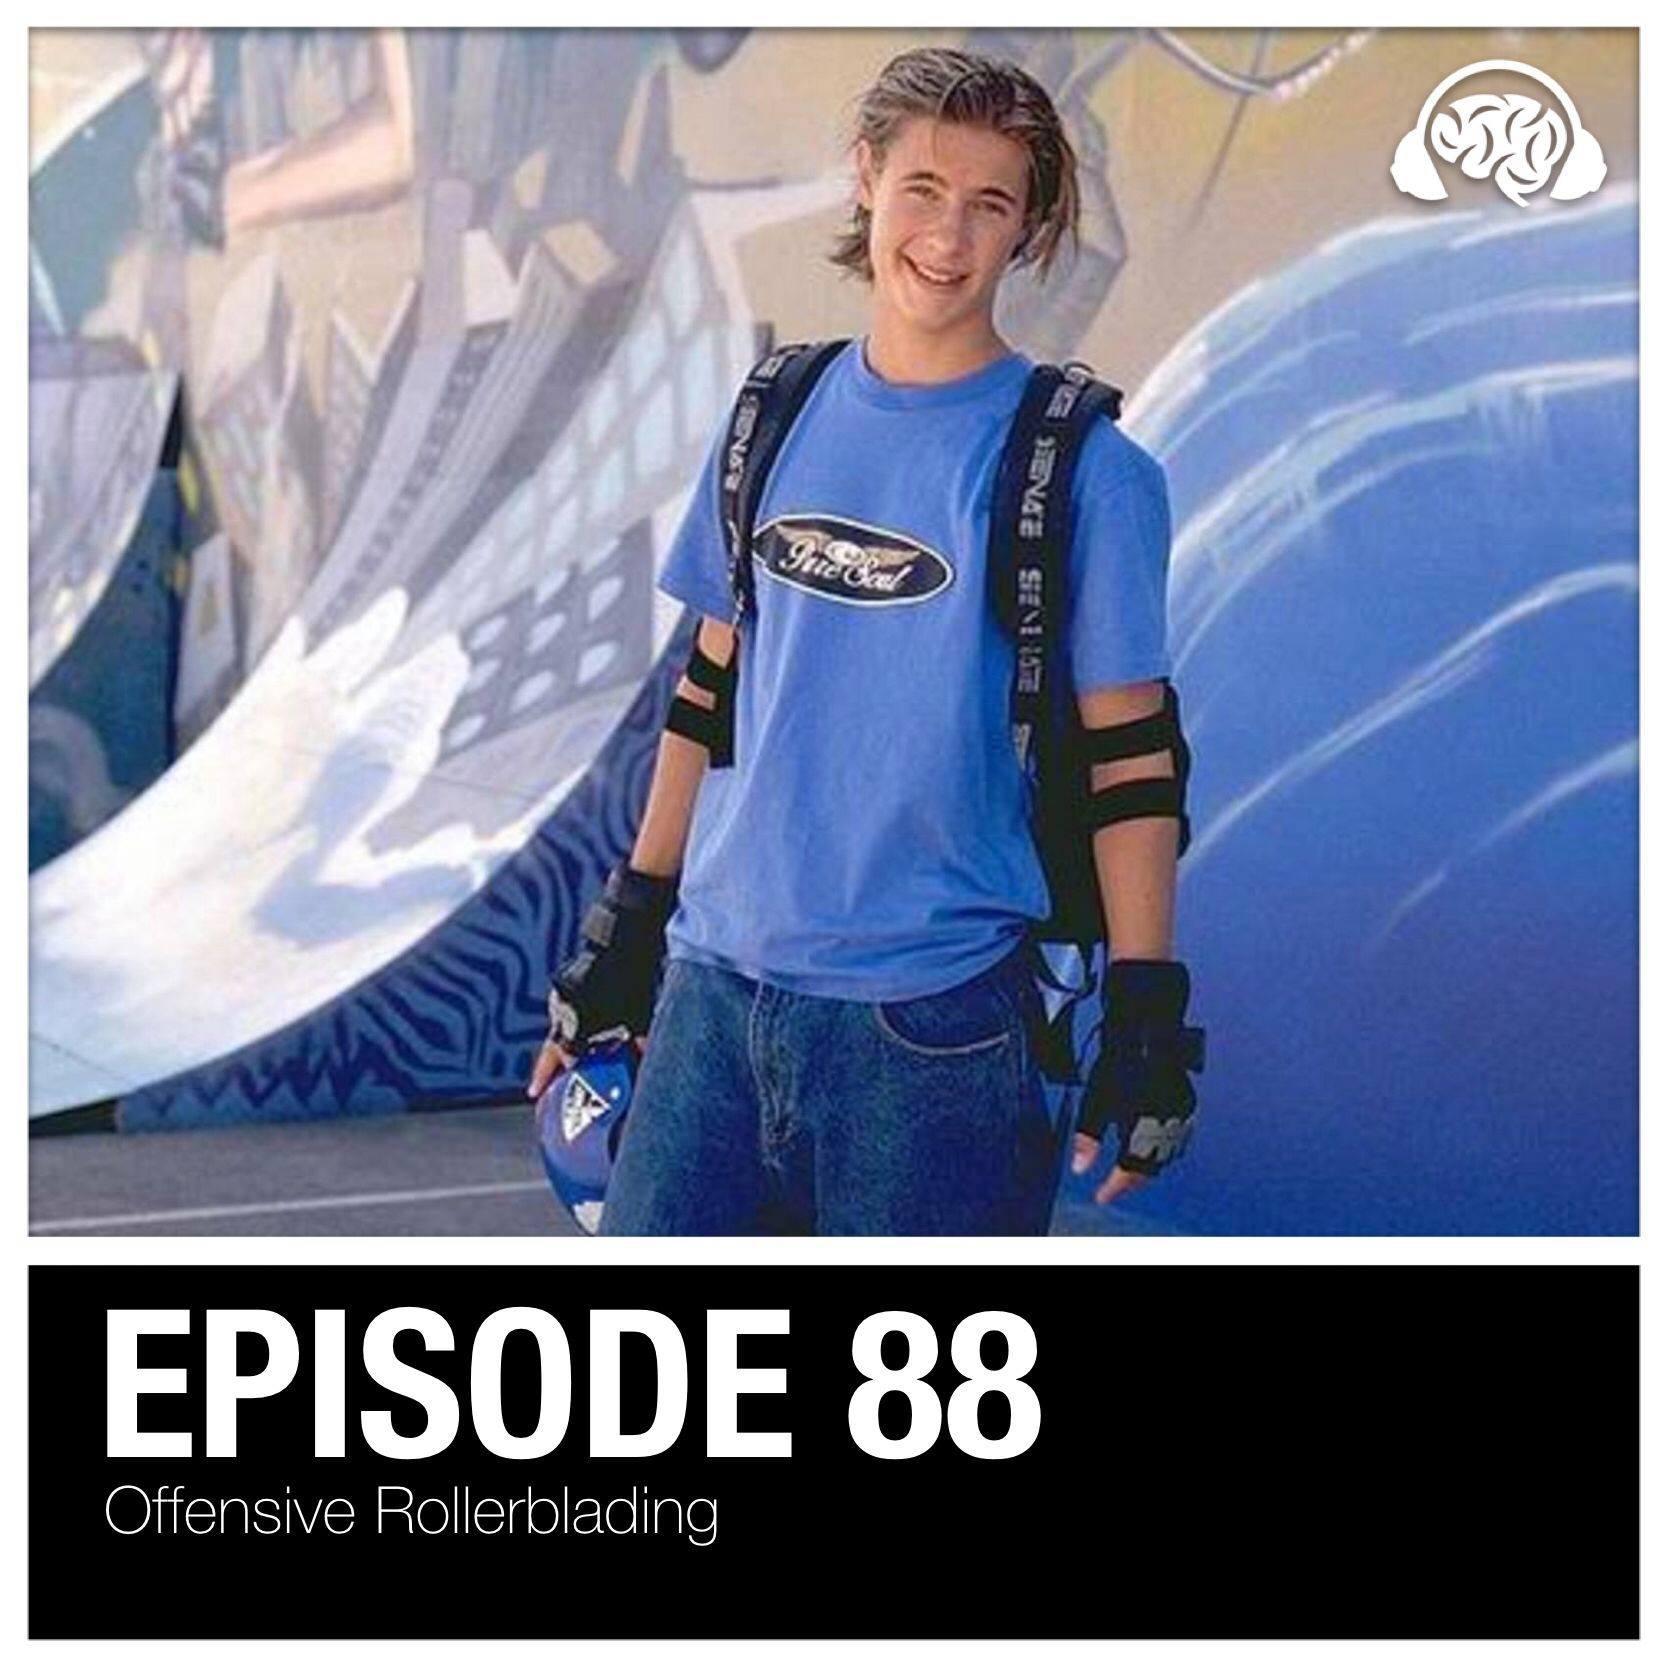 episode88.jpg